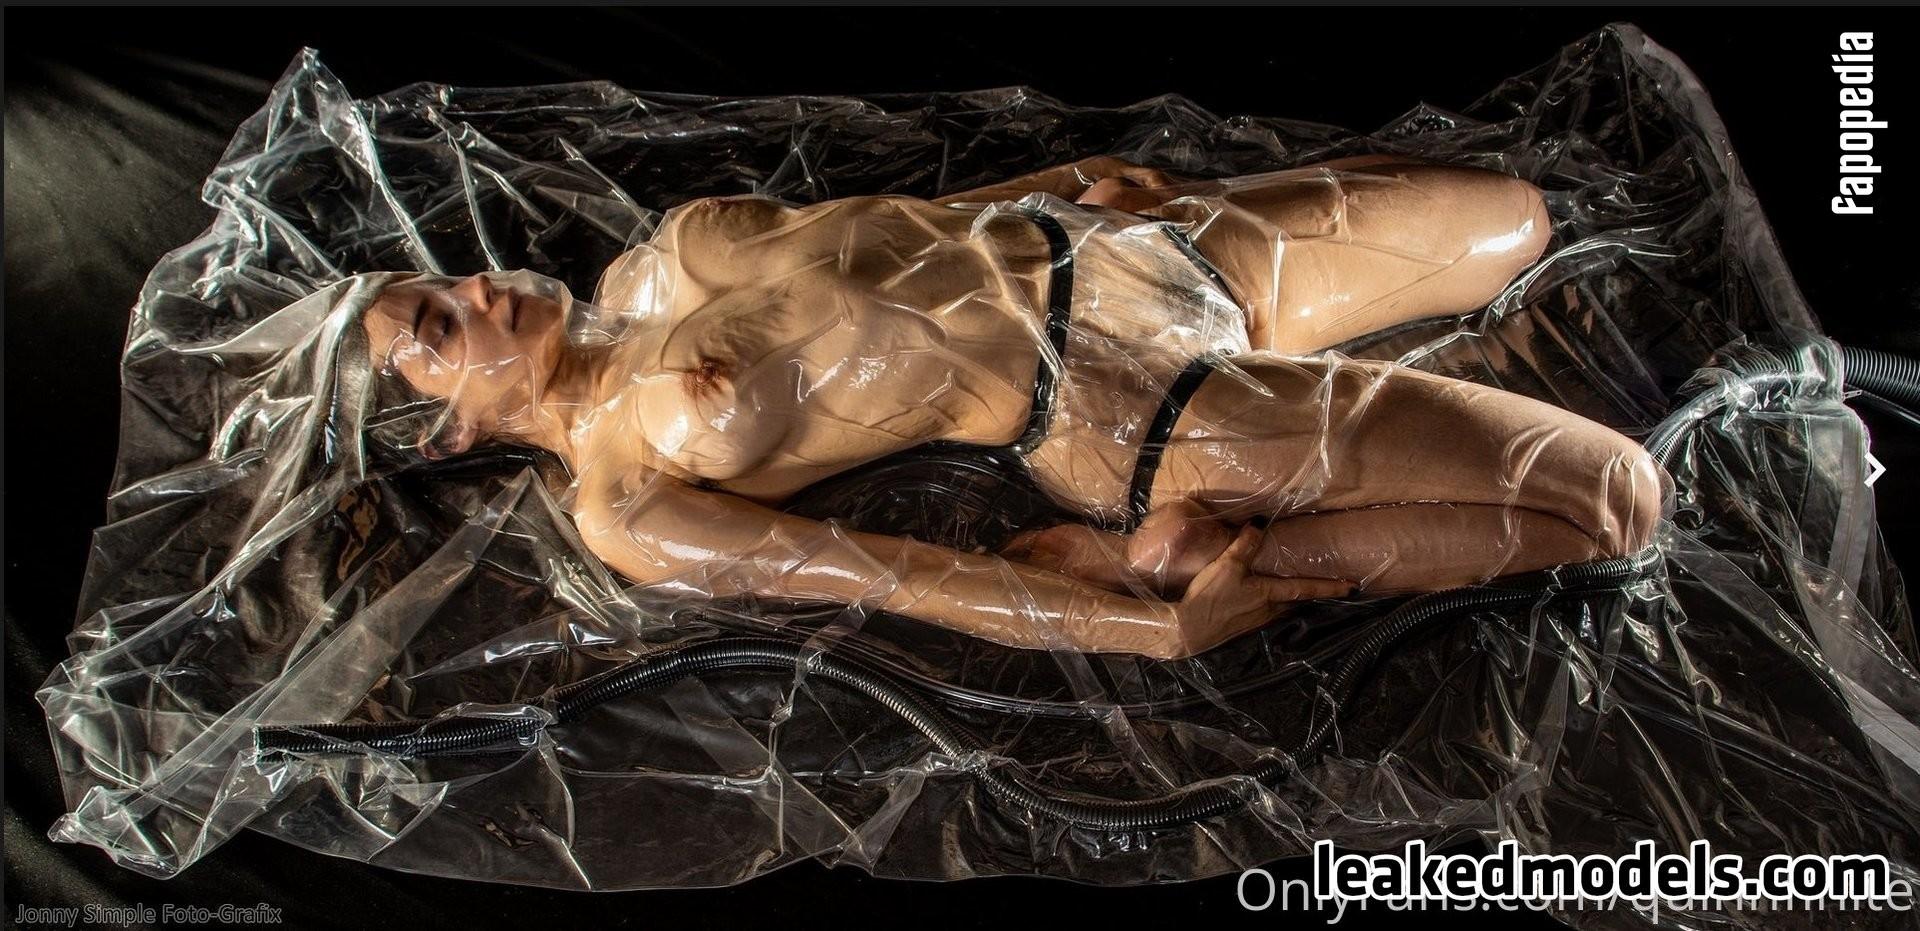 Quinn Finite Nude OnlyFans Leaks